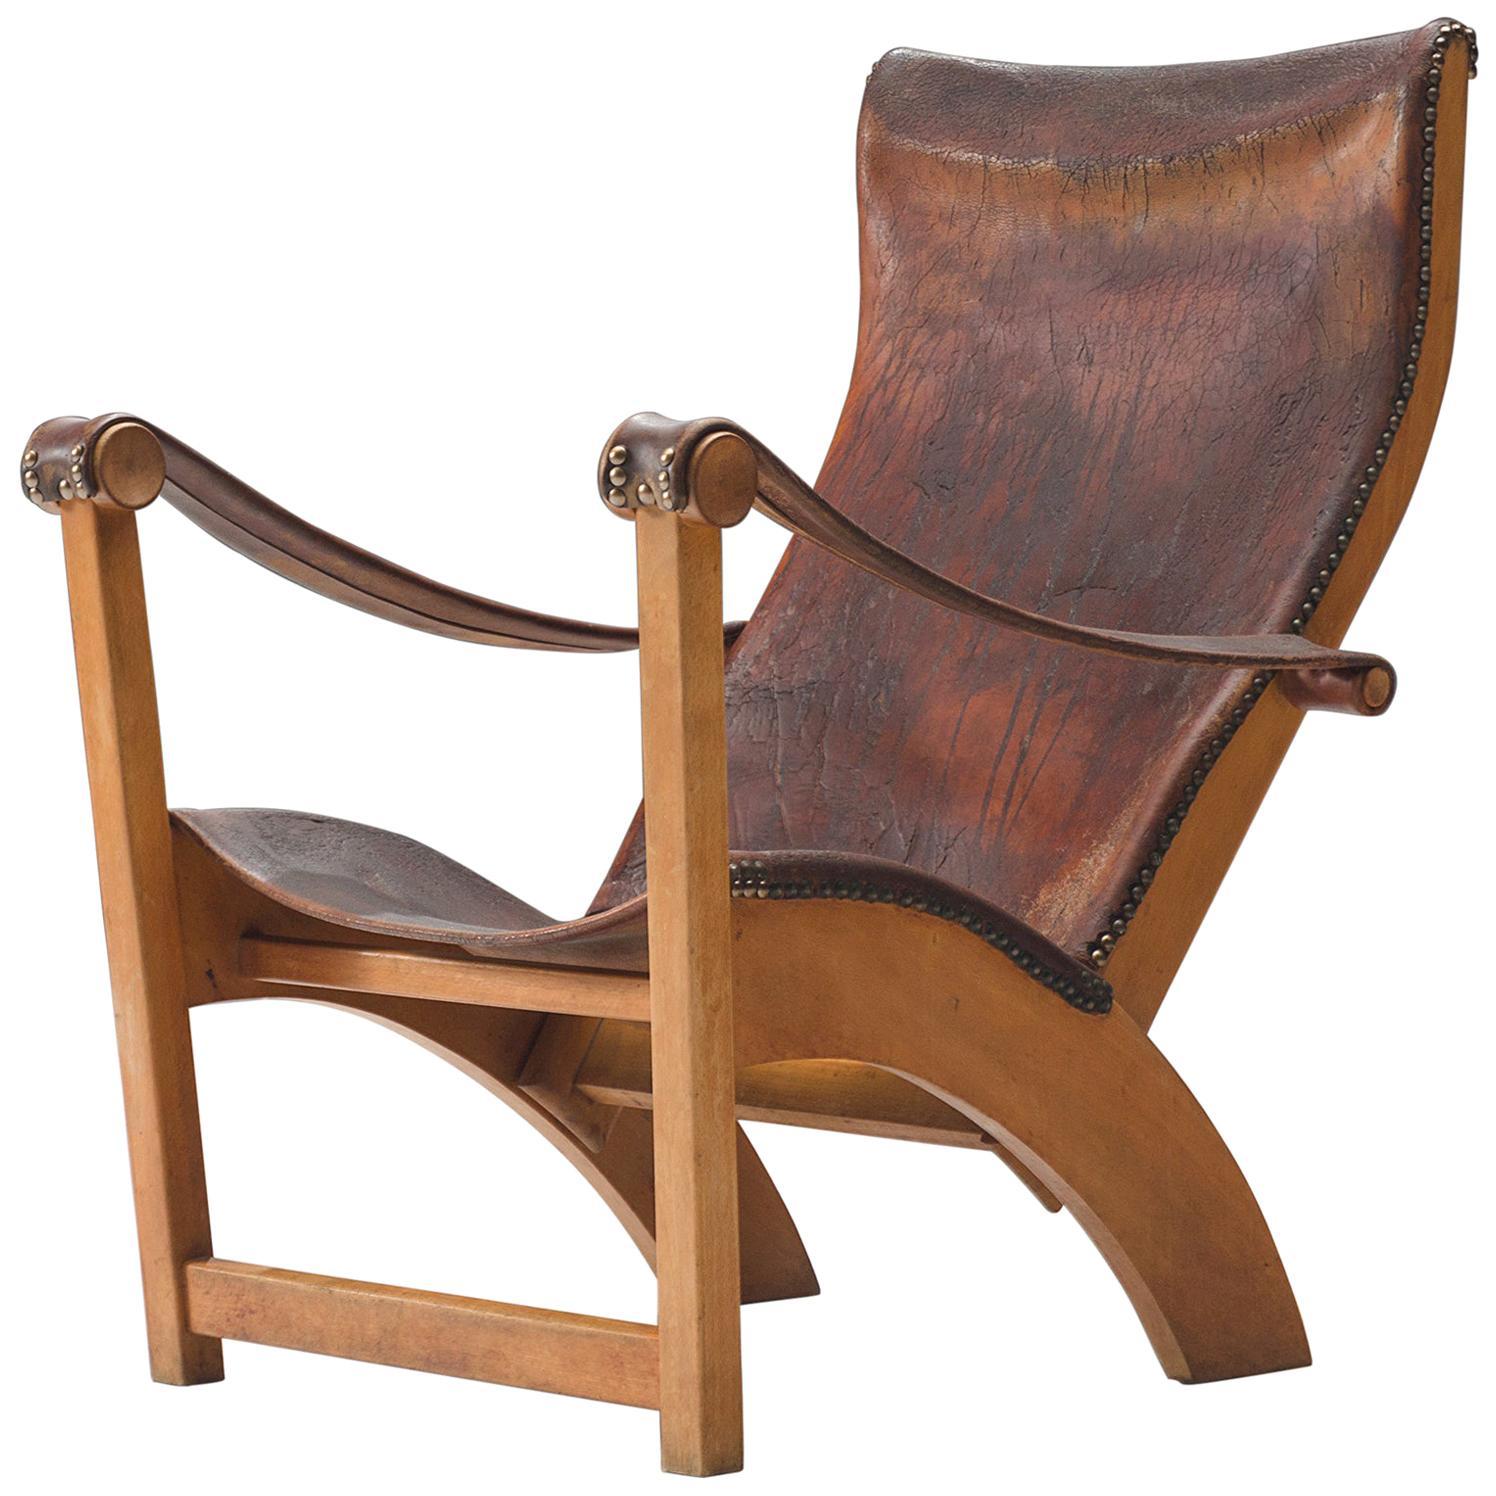 Mogens Voltelen for Niels Vodder 'Copenhagen Chair' in Original Leather